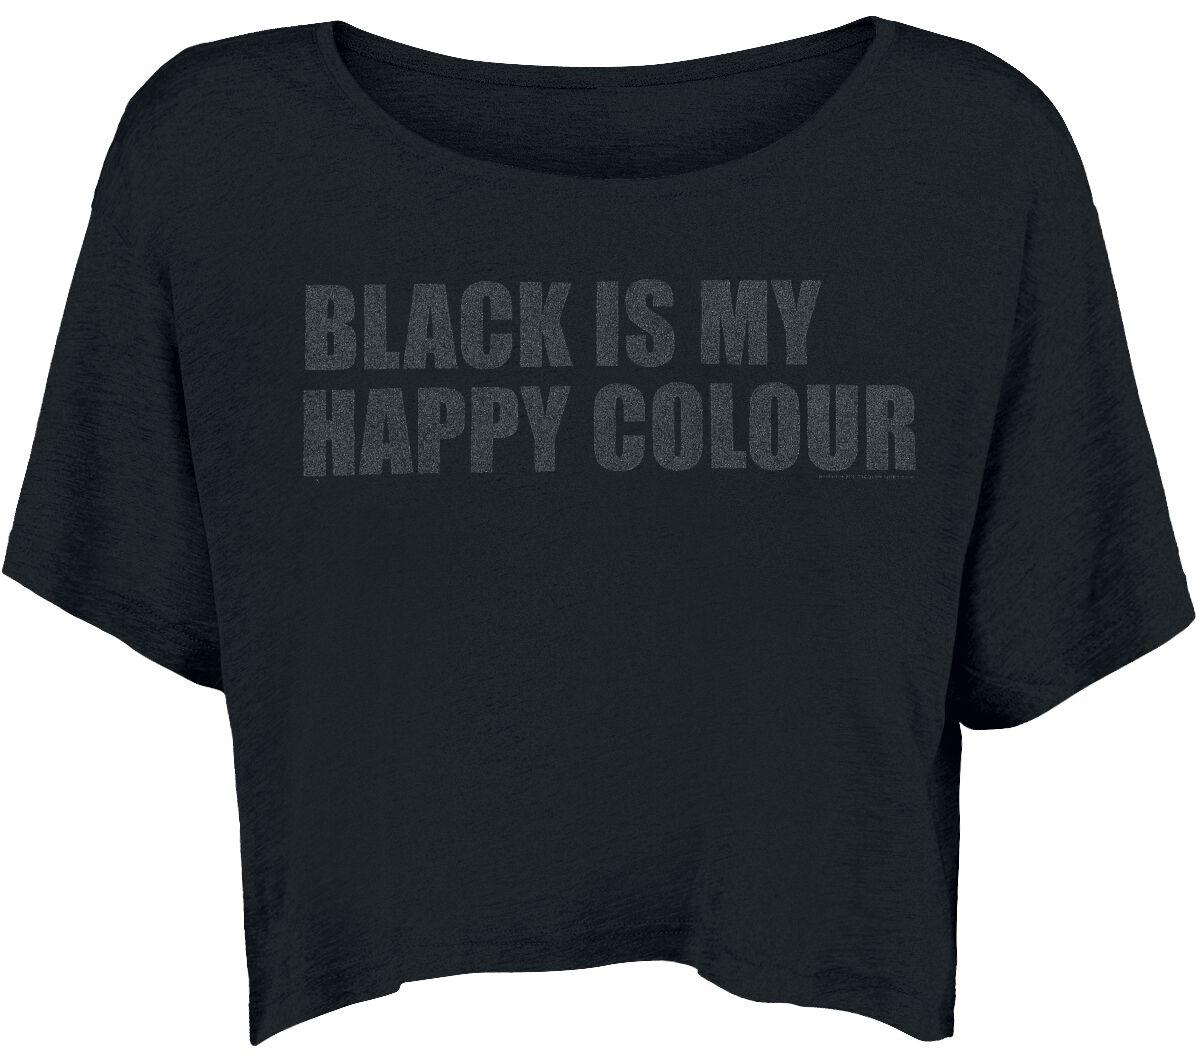 Fun Shirts - Koszulki - Koszulka damska Black Is My Happy Colour Koszulka damska czarny - 332311